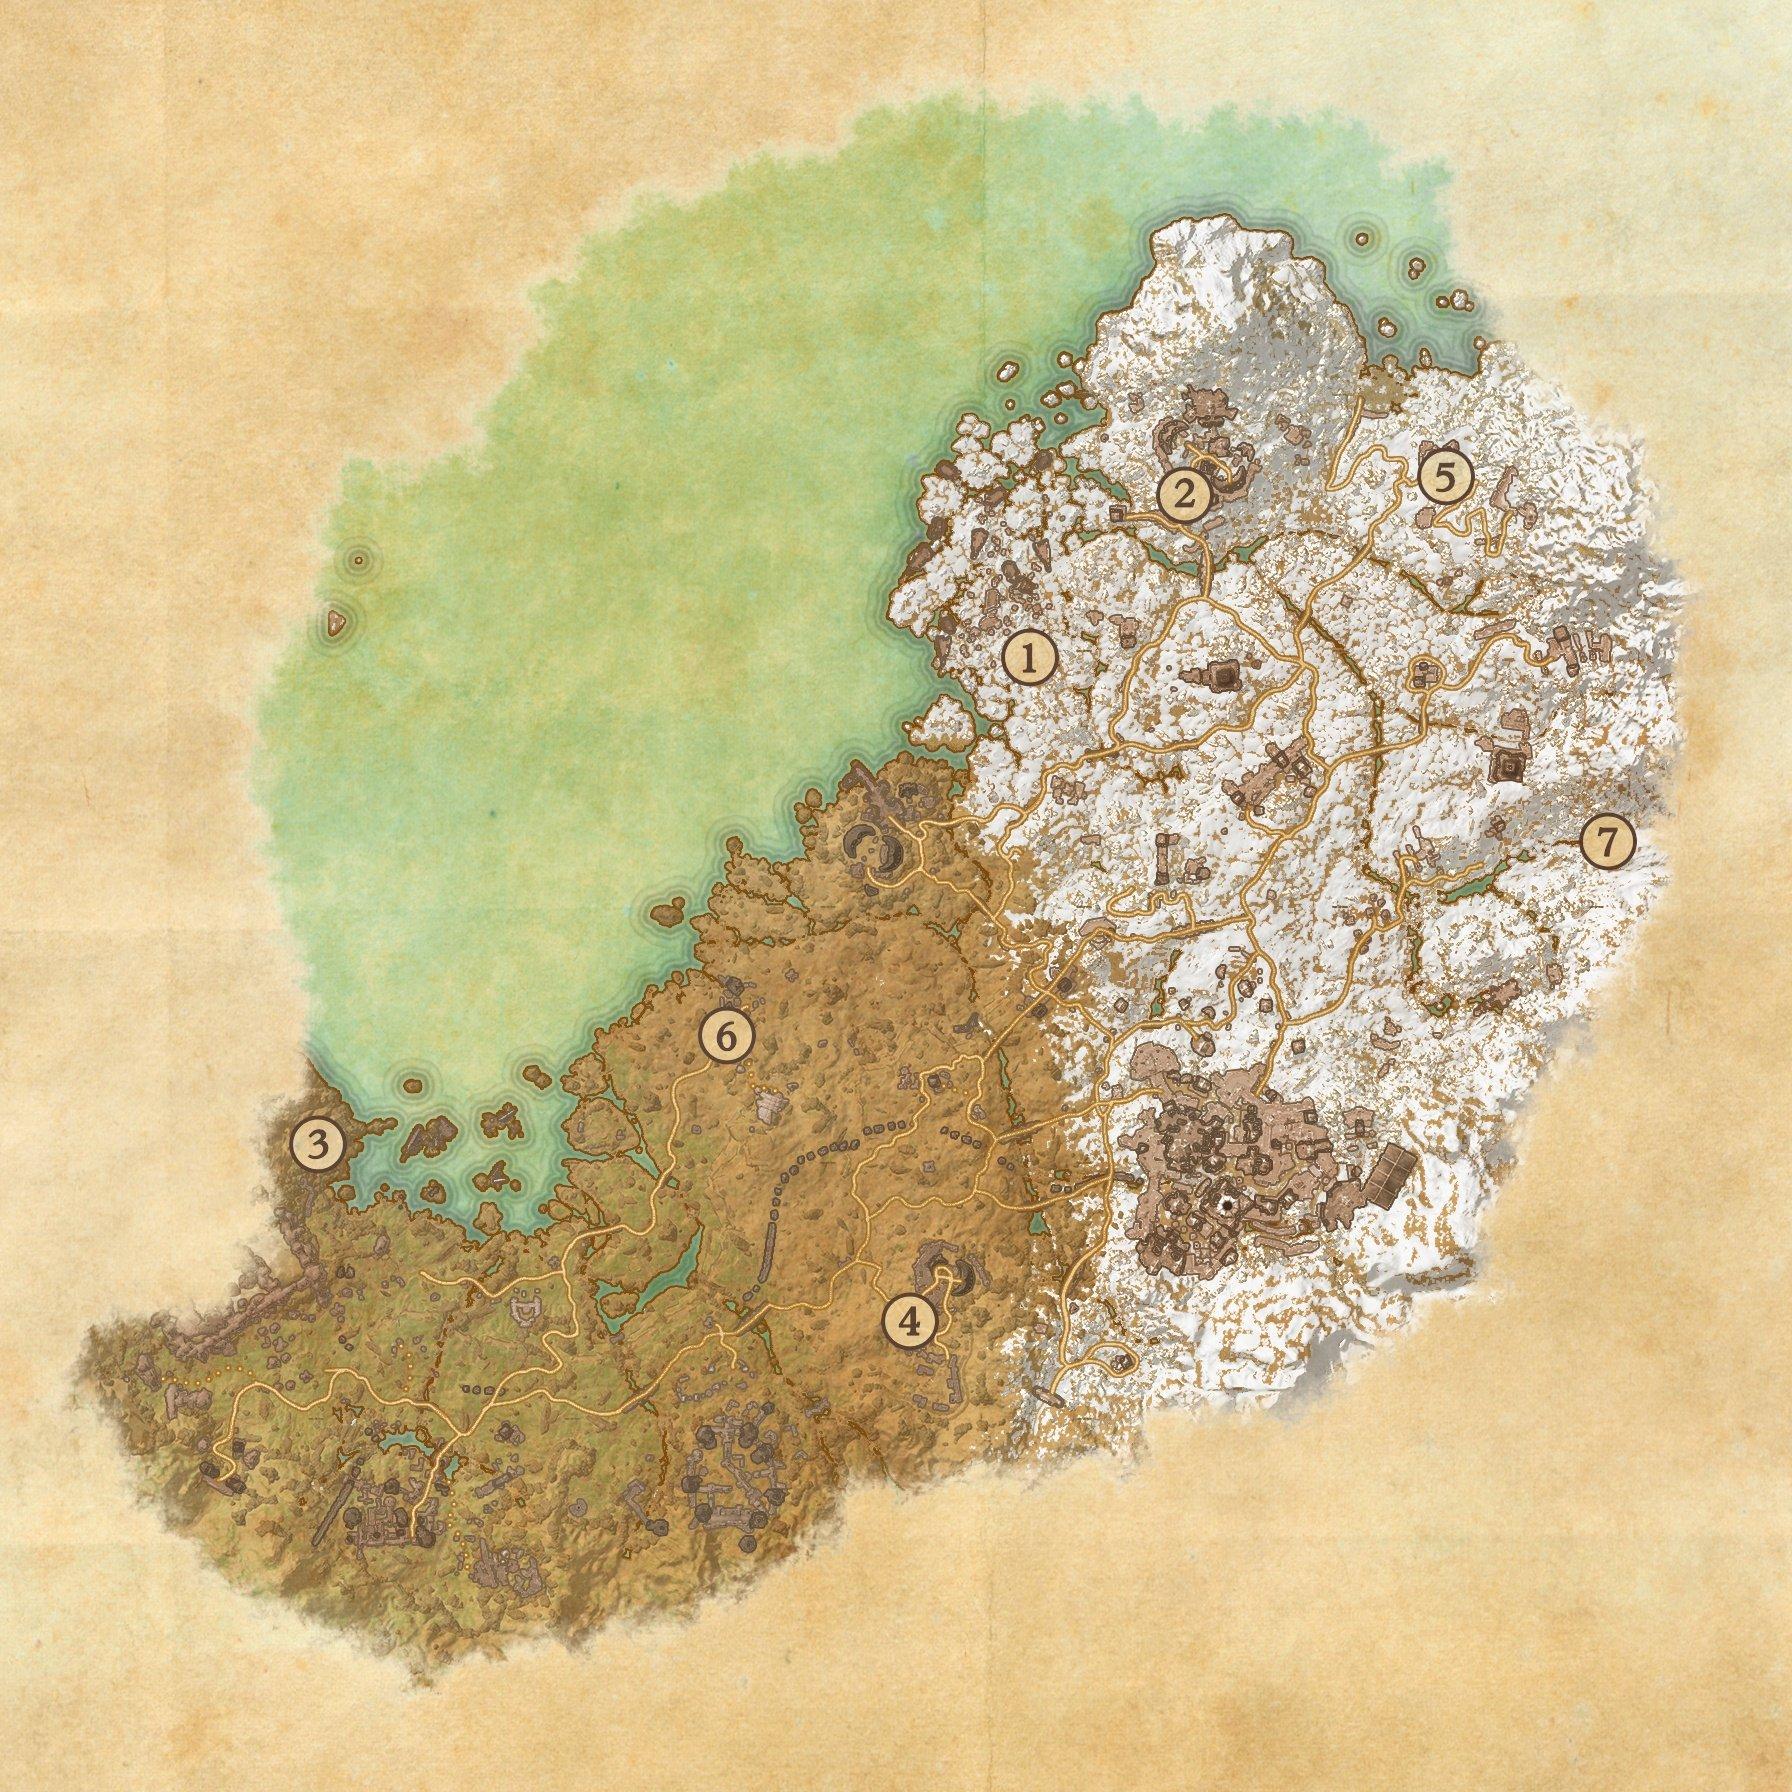 The Elder Scrolls Online Orsinium Map Is Unsurprisingly ...